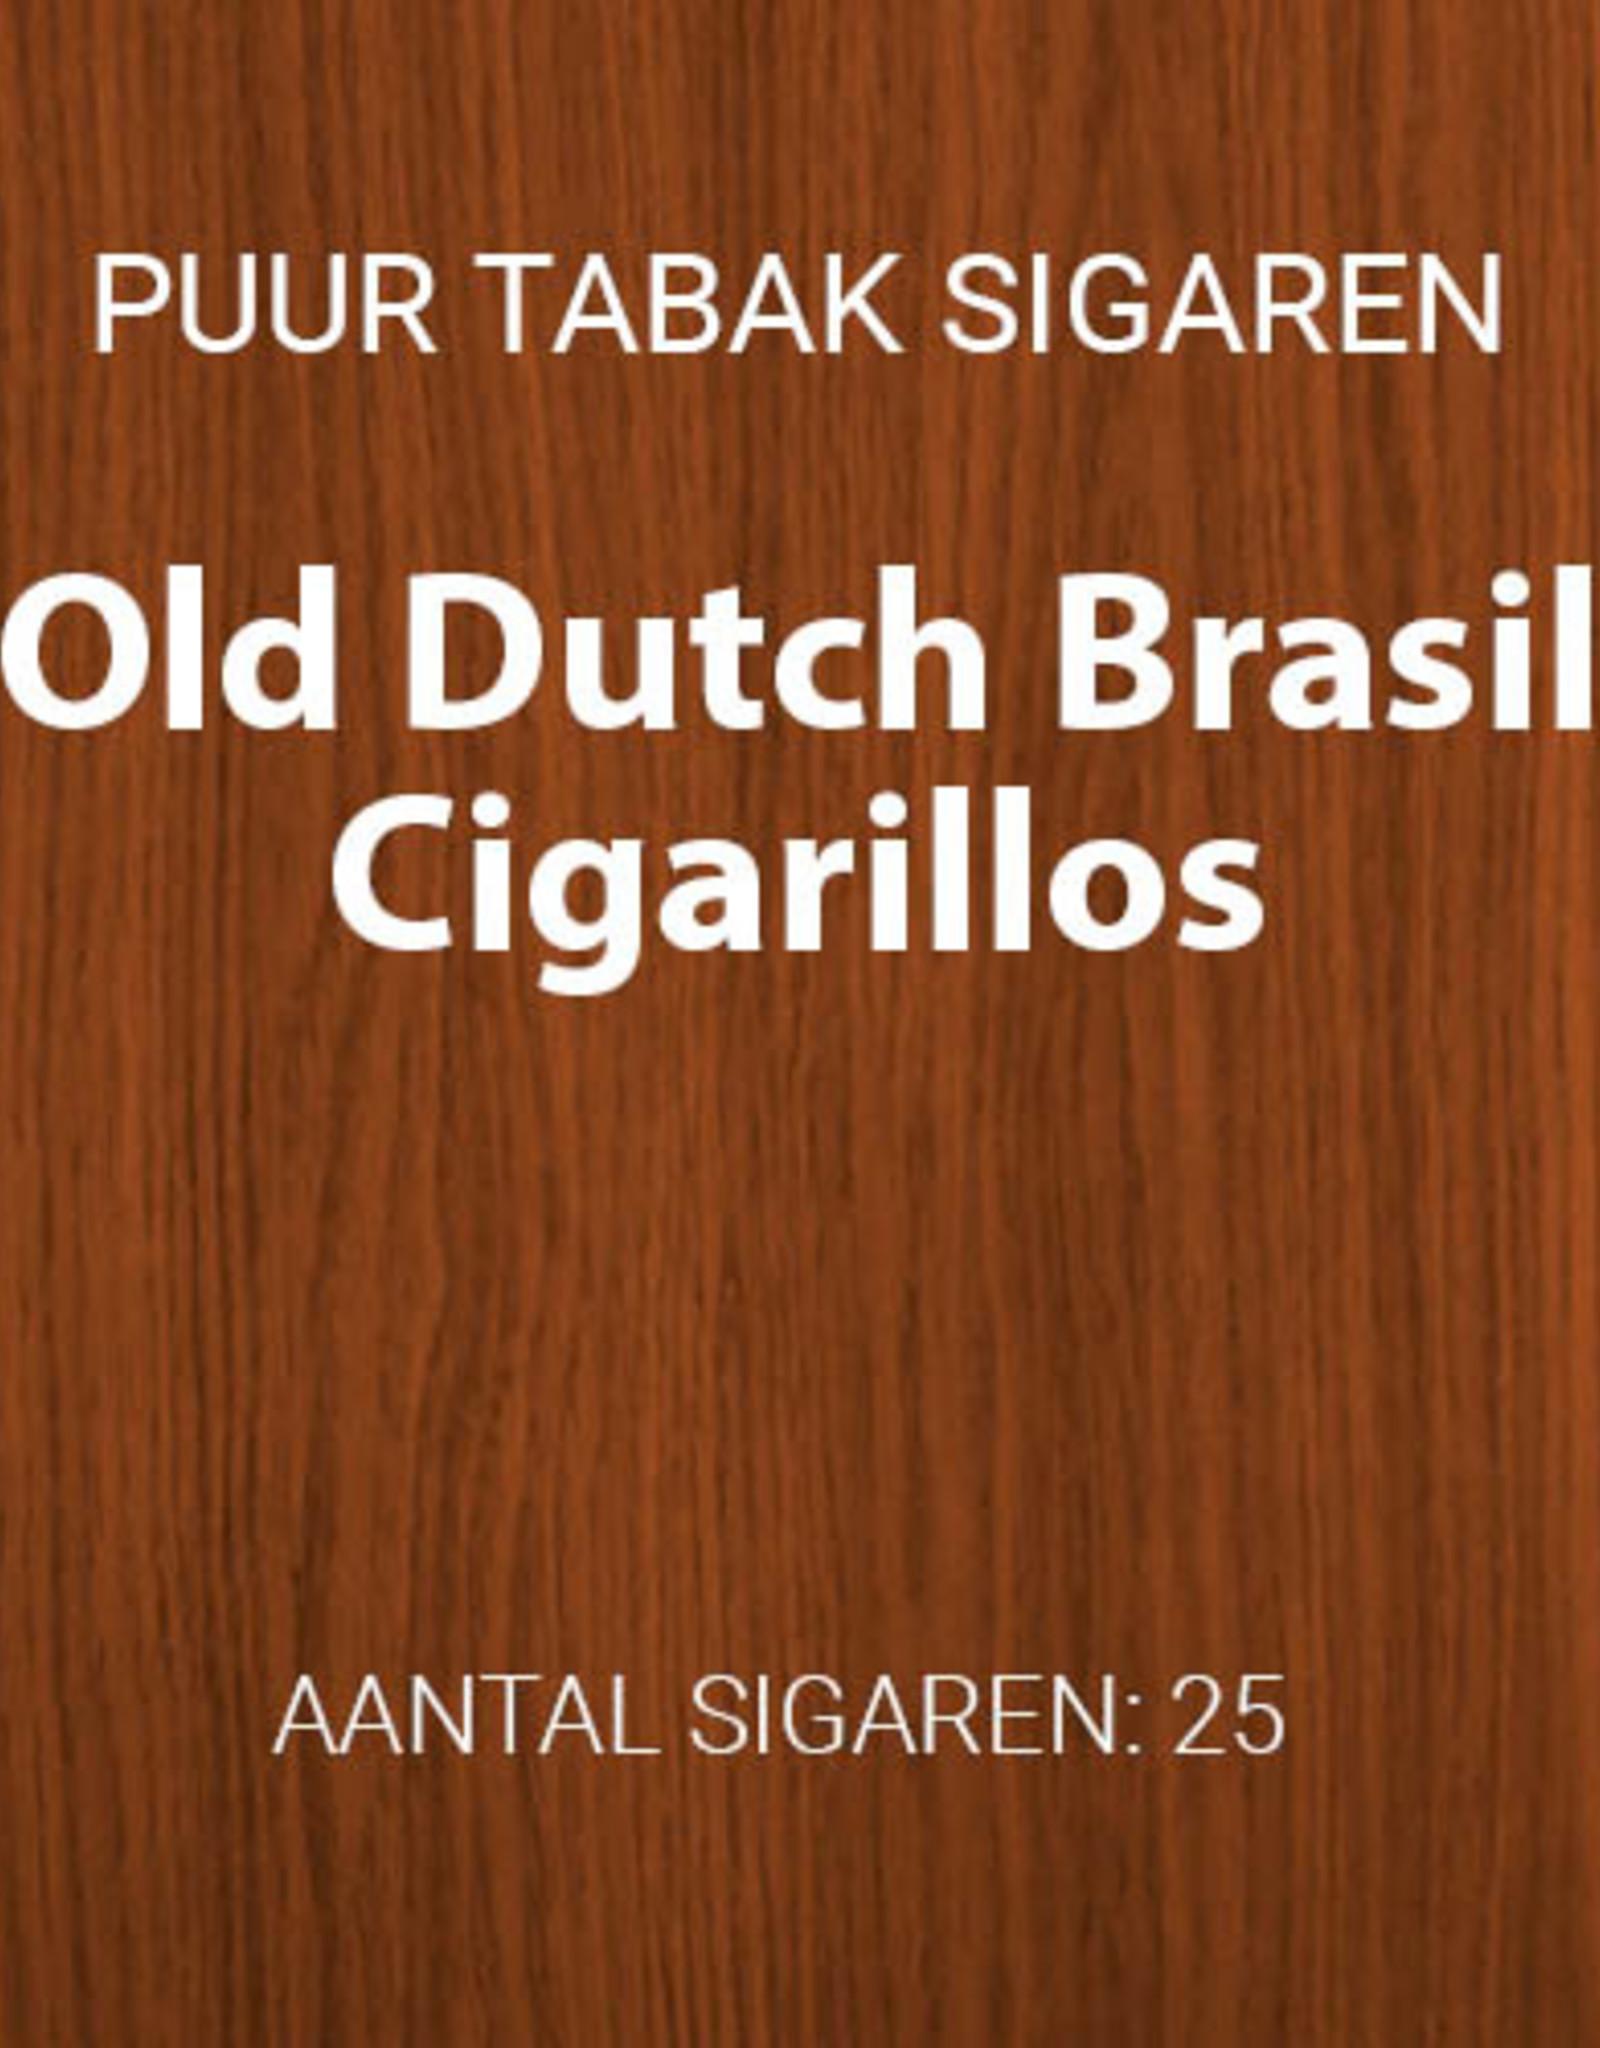 Old Dutch Old Dutch Brasil Cigarillos Brasil